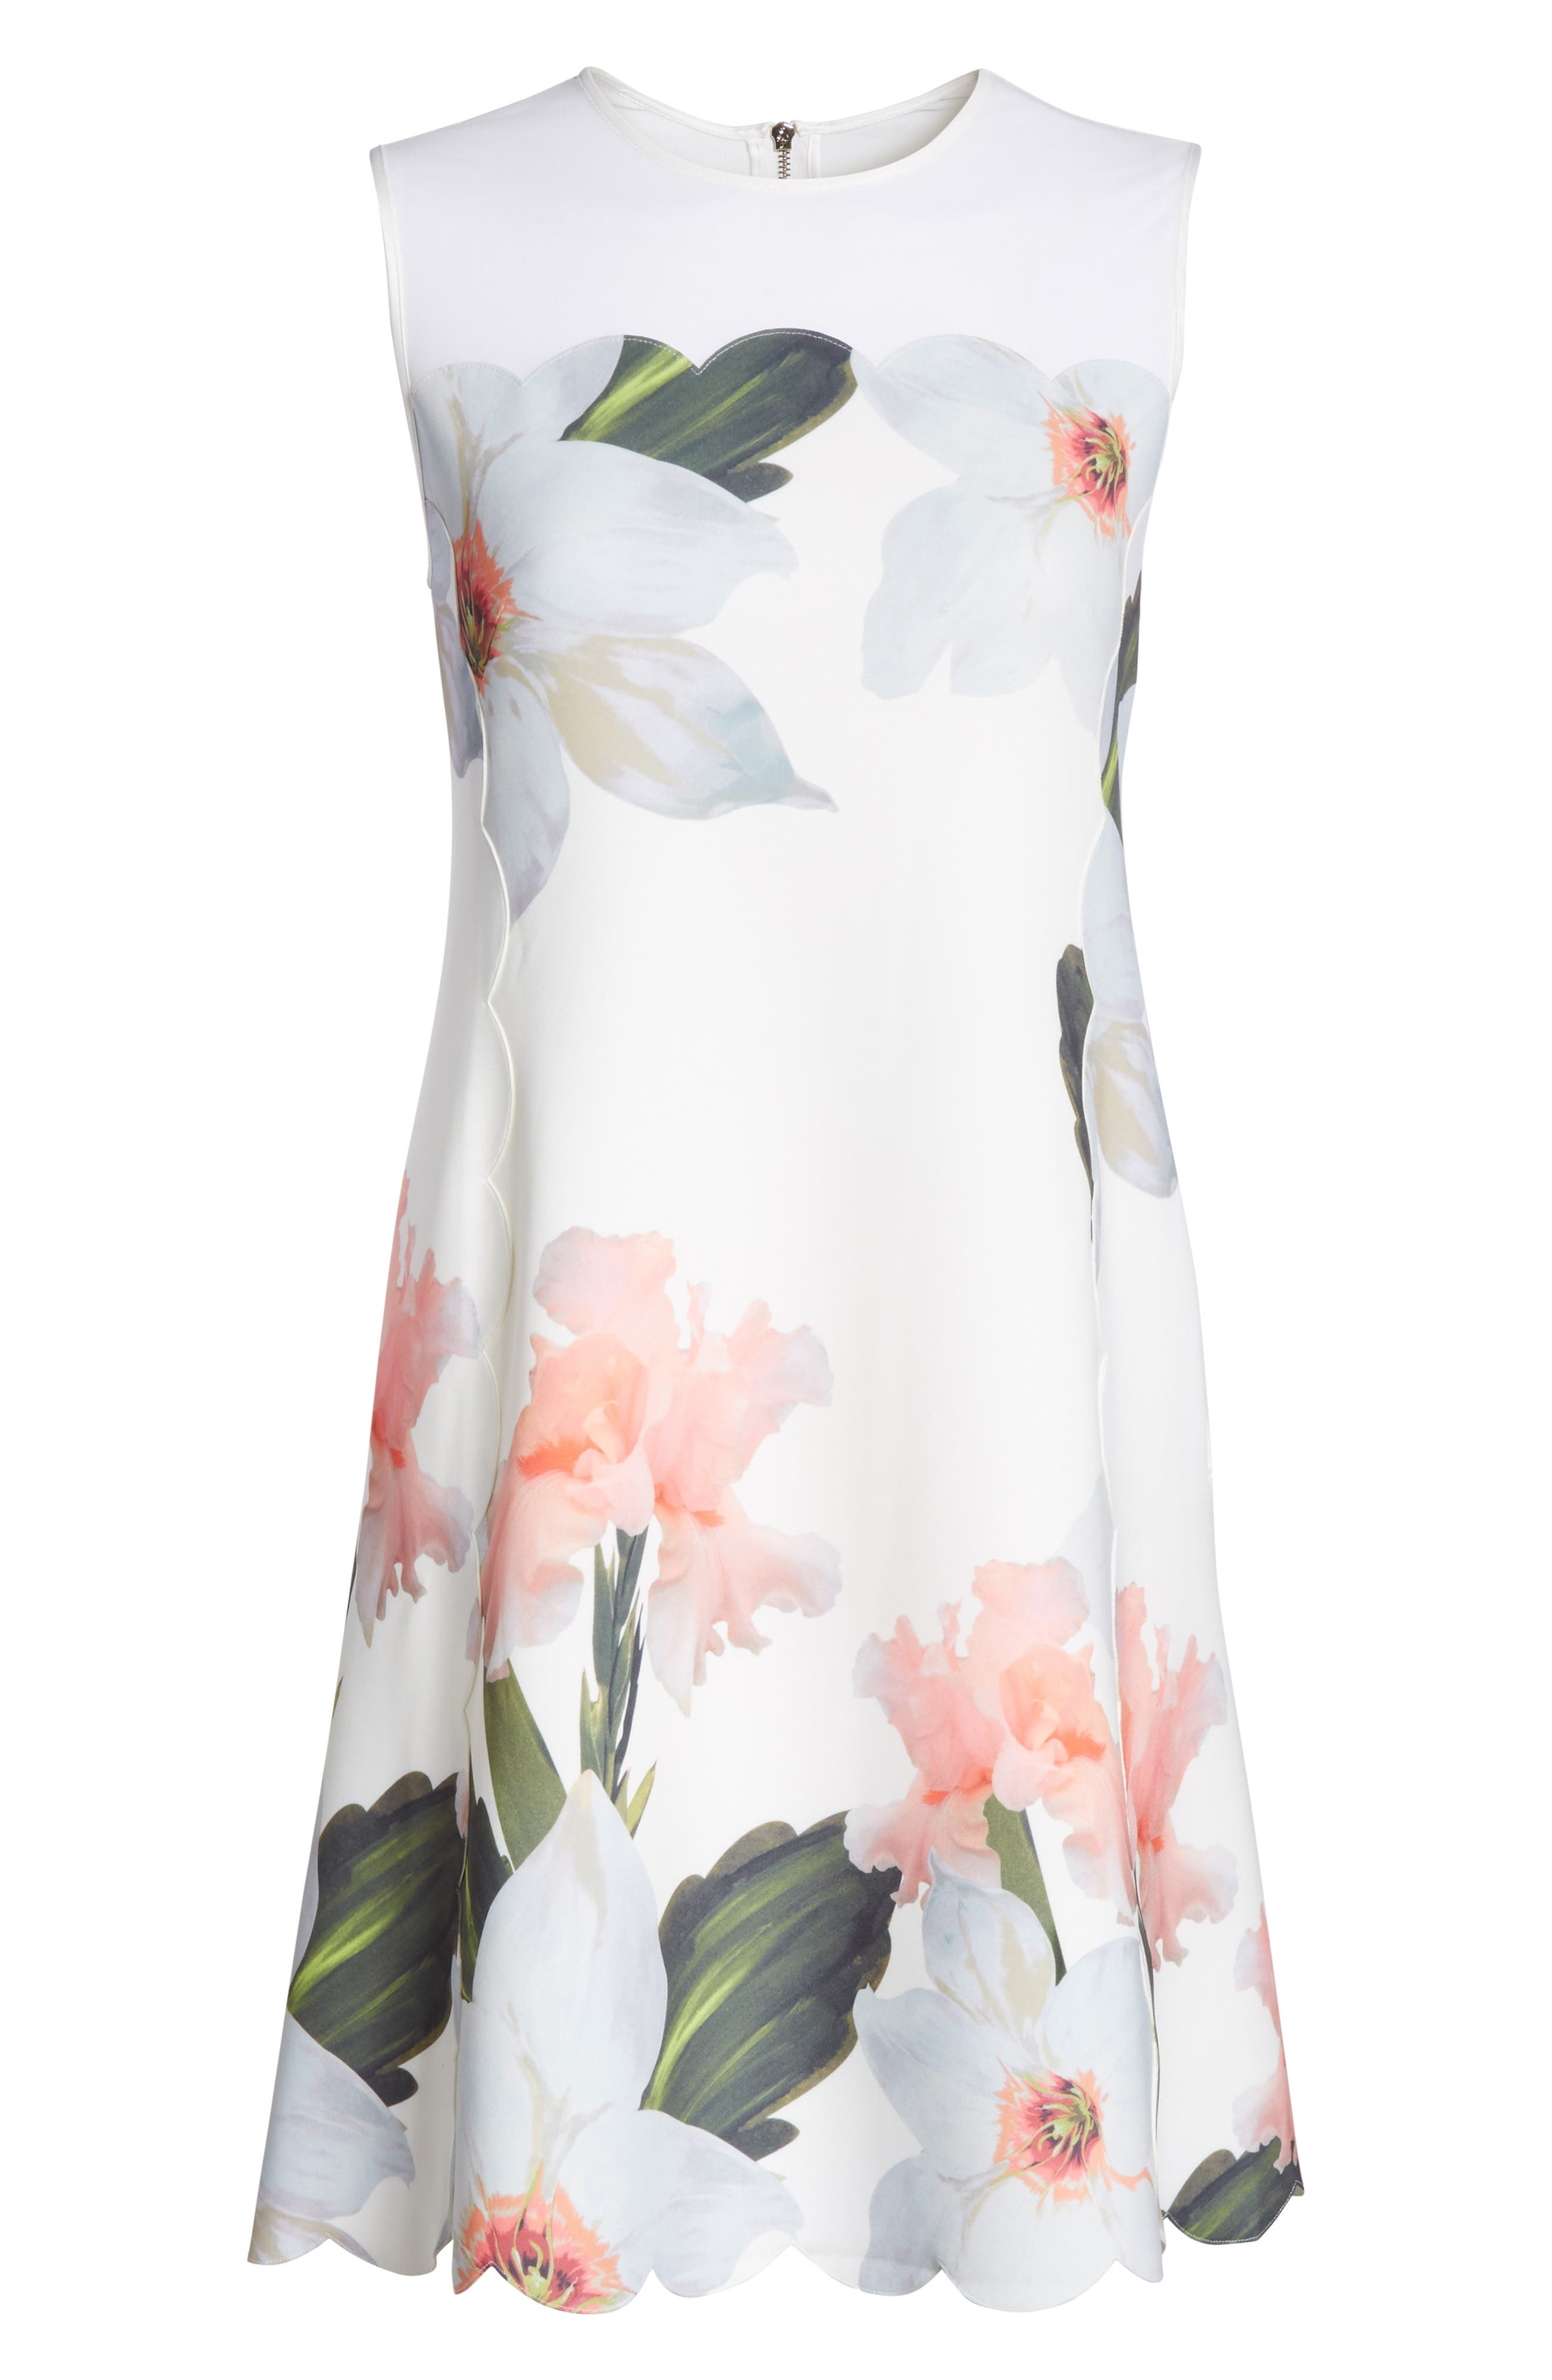 Chatsworth Bloom Tunic Dress,                             Alternate thumbnail 6, color,                             110